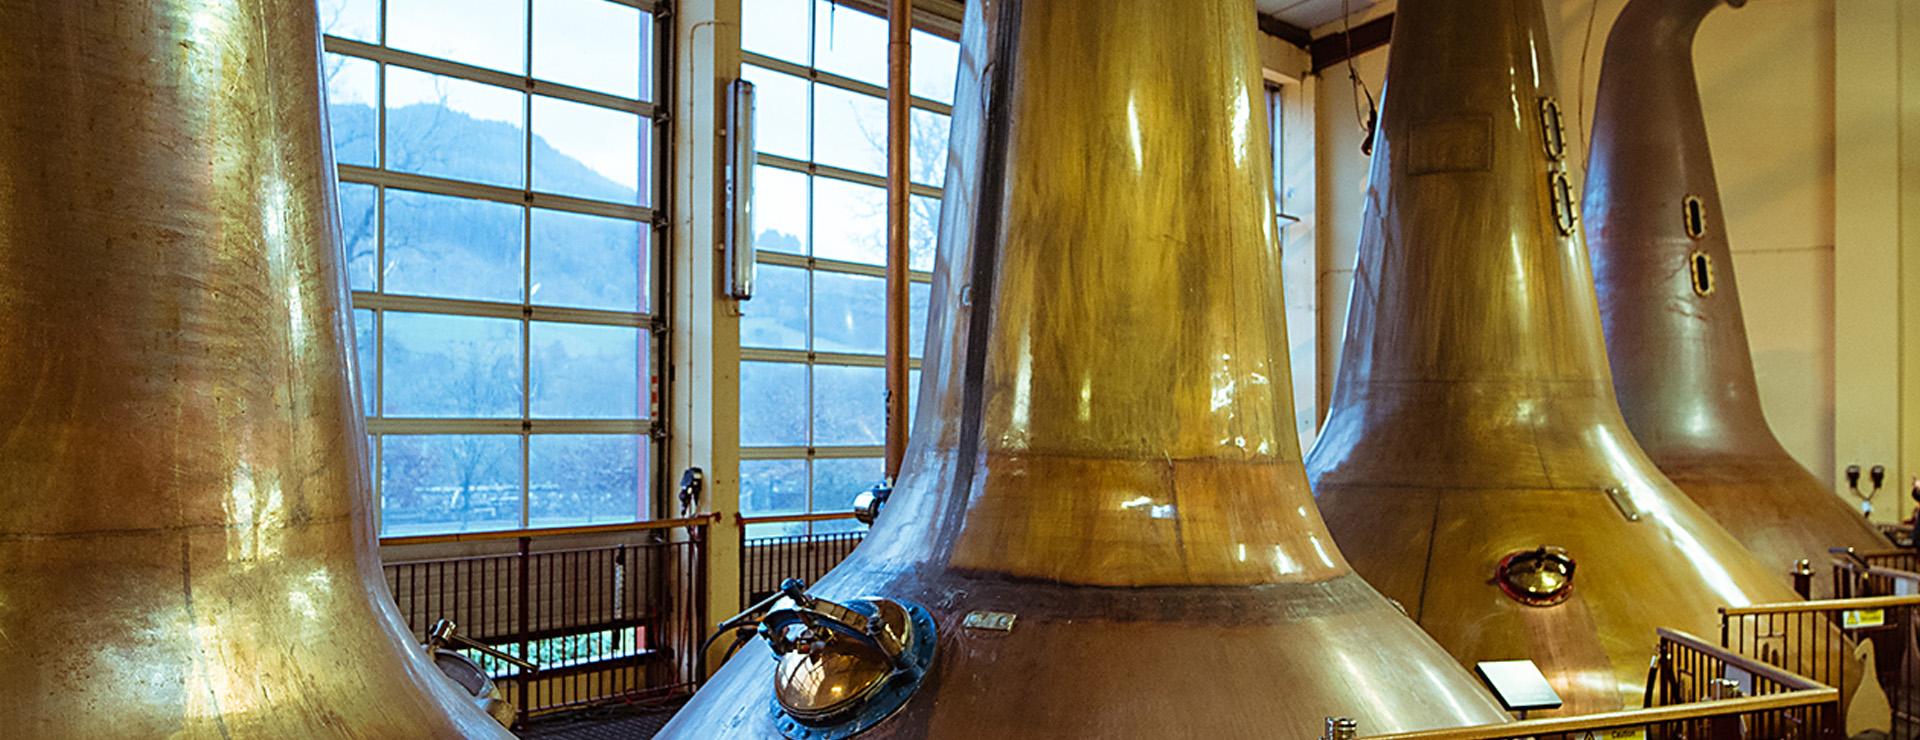 Dewars Whisky Distillery Aberfeldy Scotland